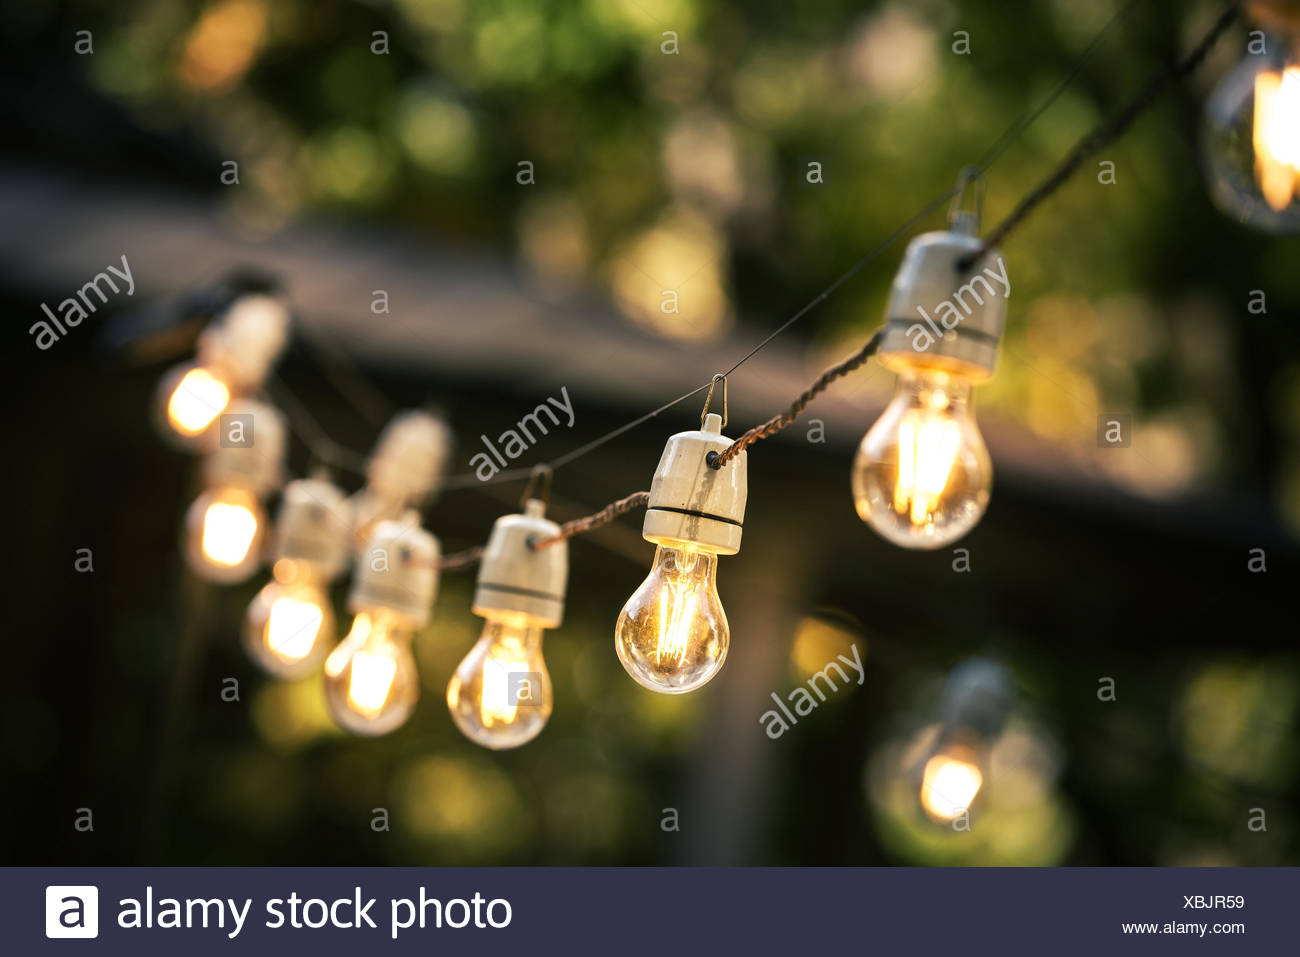 String of outdoor lights night lighting stock photos string of outdoor string lights hanging on a line in backyard stock image aloadofball Gallery